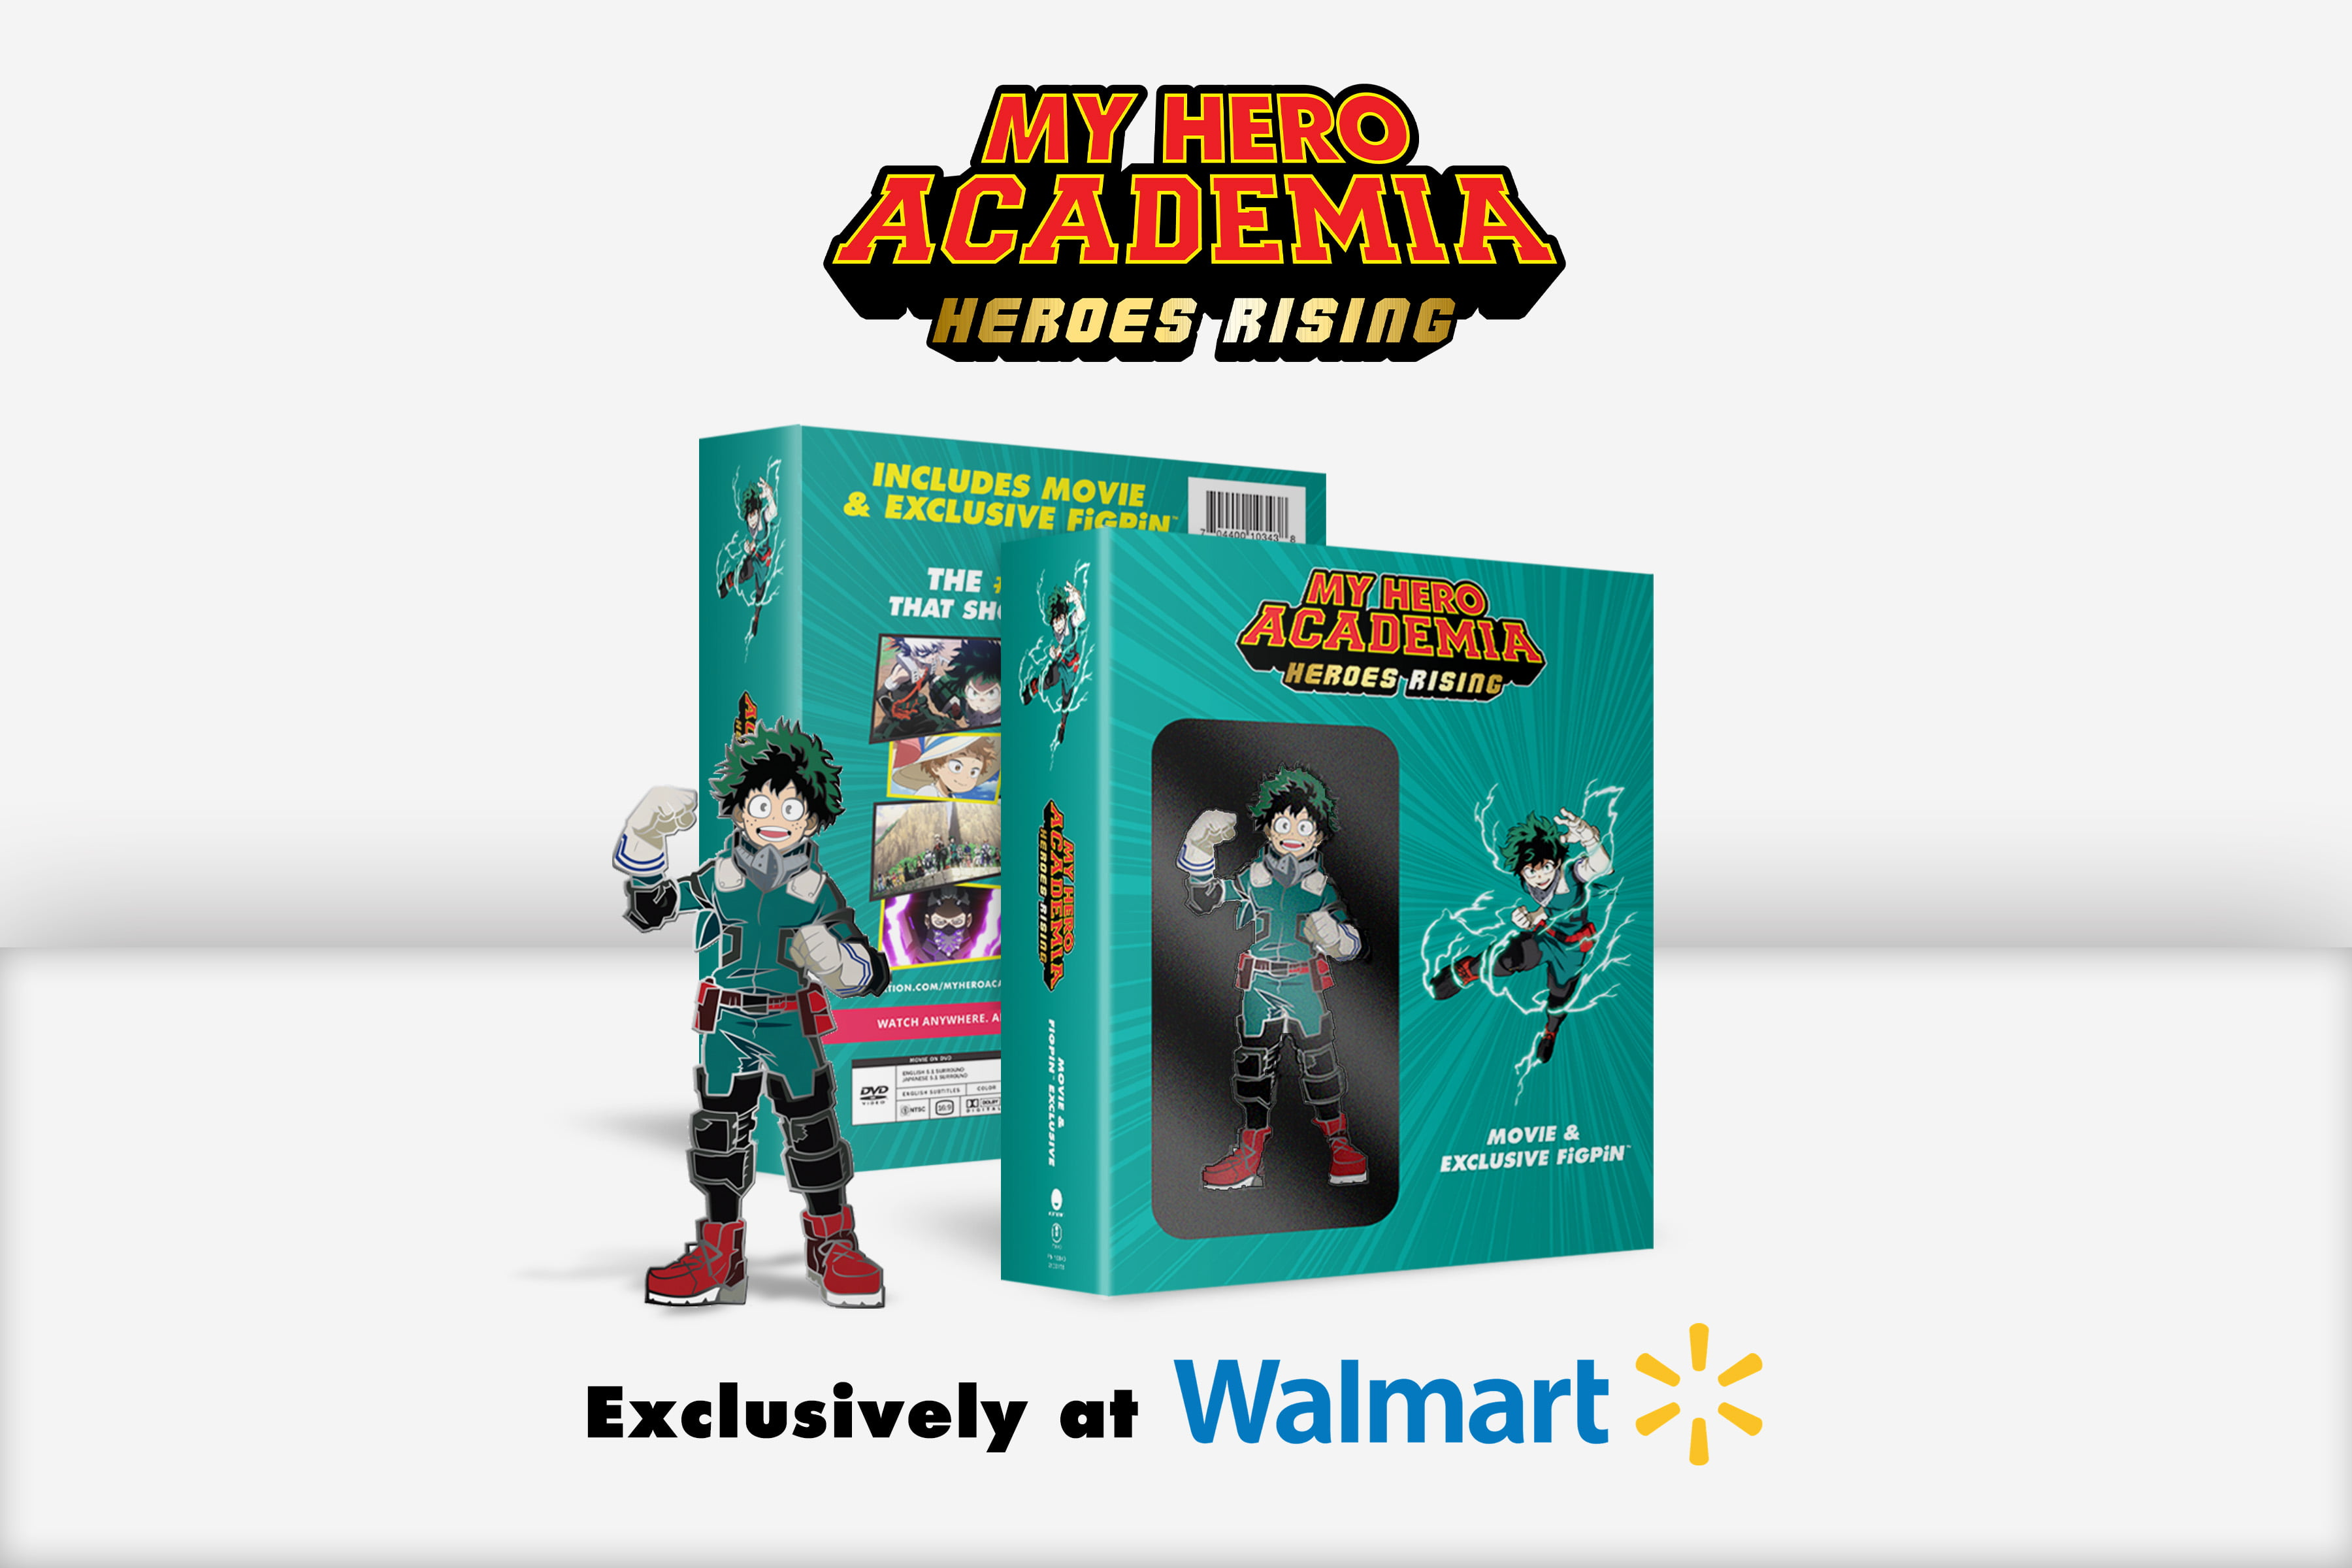 My Hero Academia Heroes Rising Walmart Exclusive Blu Ray Dvd Digital Copy Deku Figpin Walmart Com Walmart Com